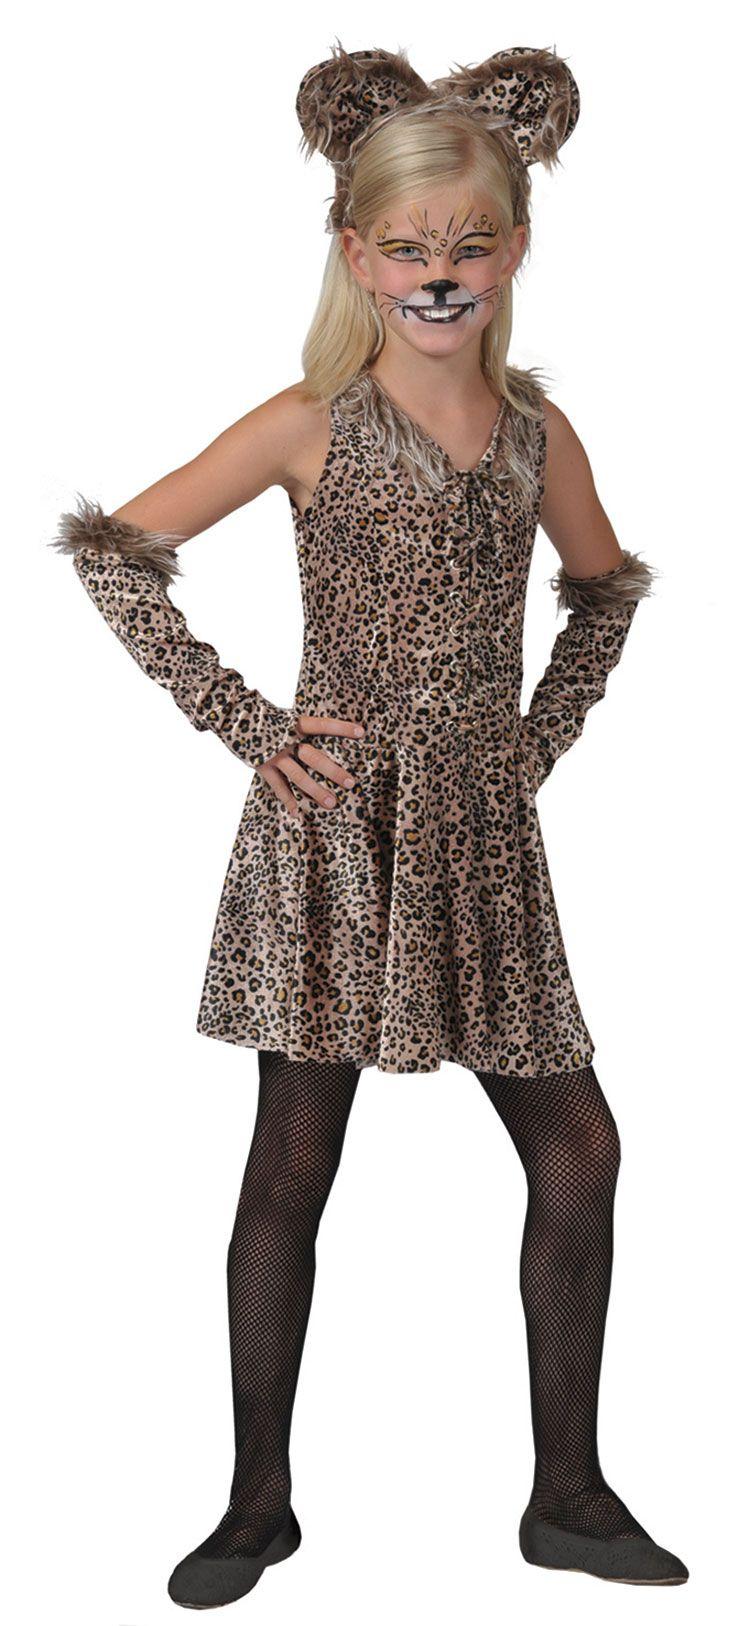 4661c749b0bf Girls Leopard Costume - Kids Costume | Halloween in 2019 | Leopard ...